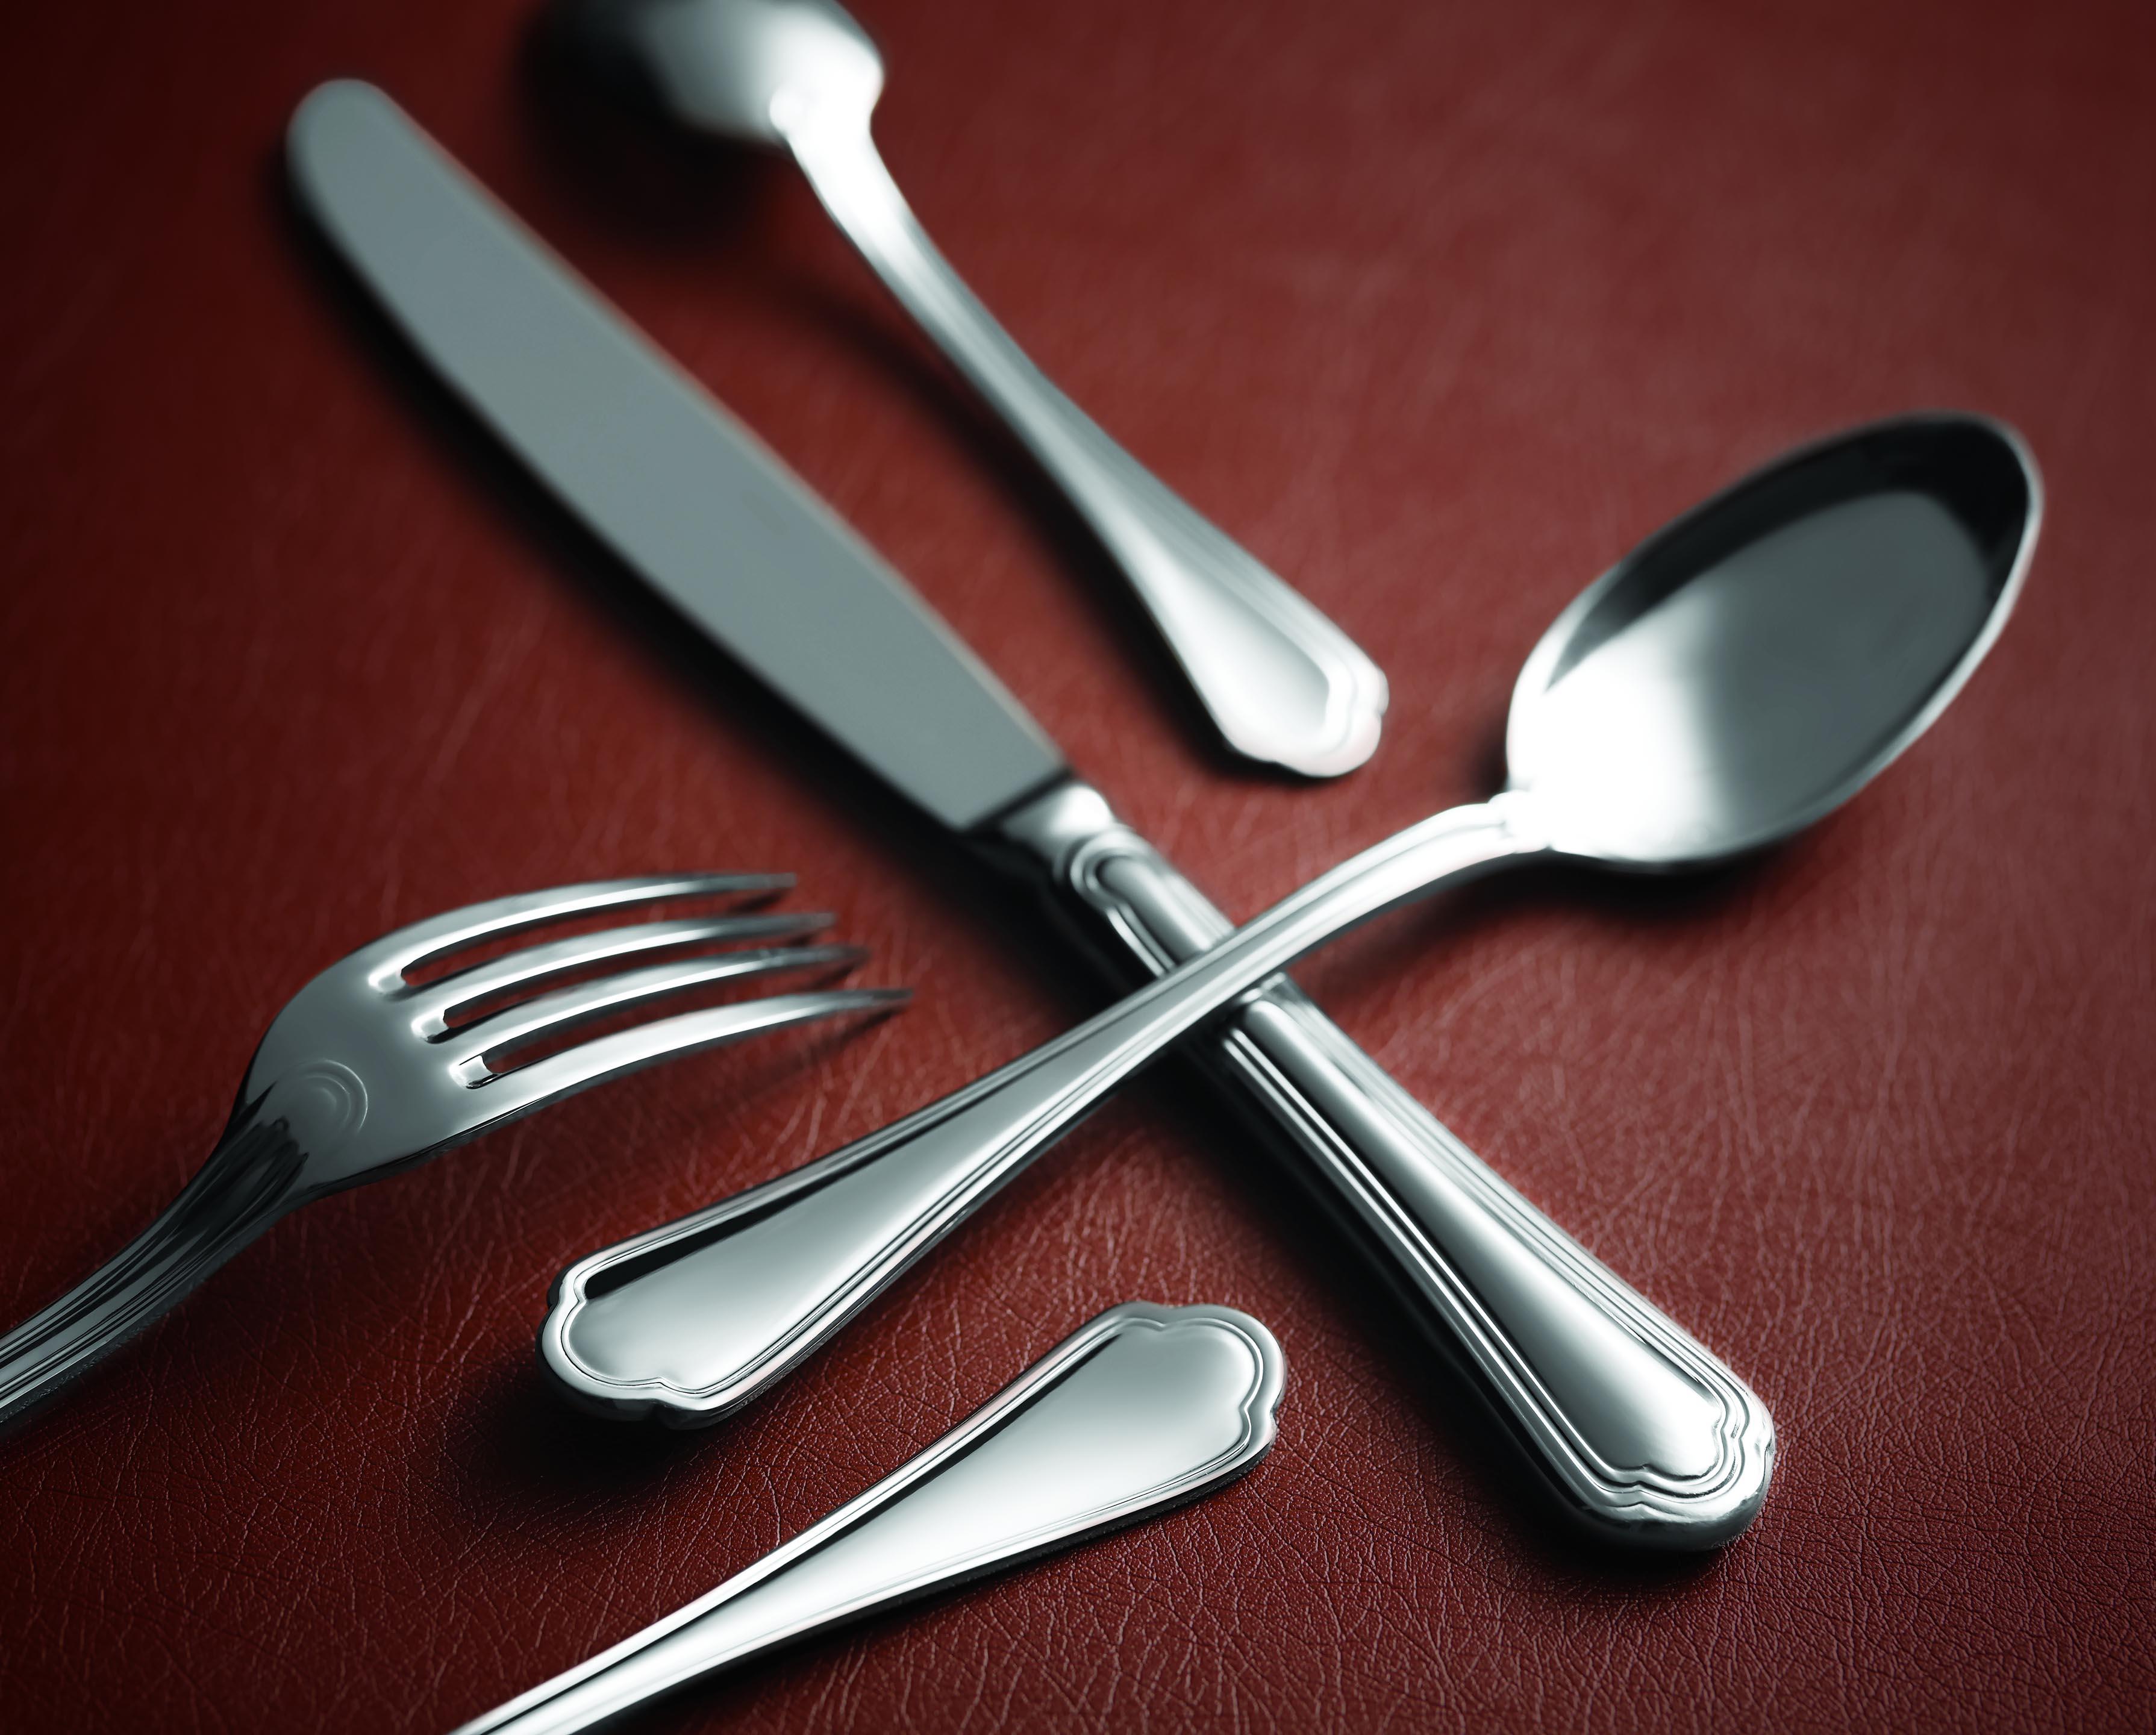 Sant Andrea Silverplate Rossini Table Knives Set Of 12 By Oneida New Flatware Ebay